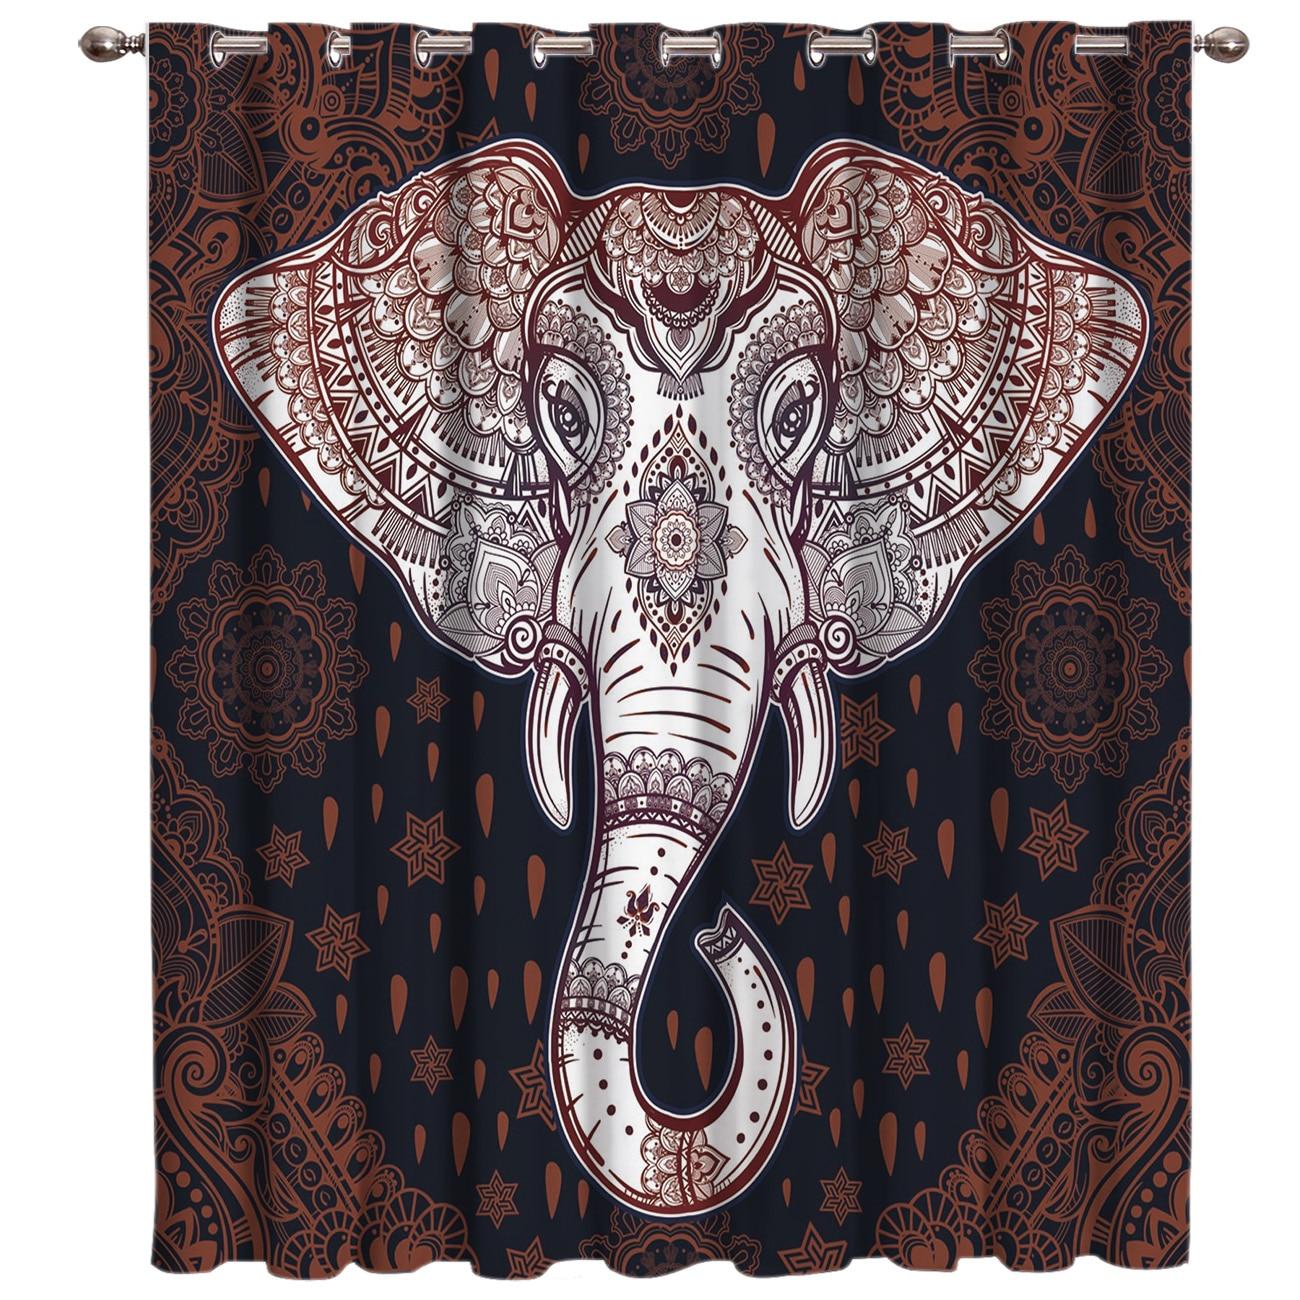 Cortinas de tratamiento de ventanas de elefante indio de África cortinas de ventana de cenefa decoración oscura cortinas de baño cocina tela de exterior